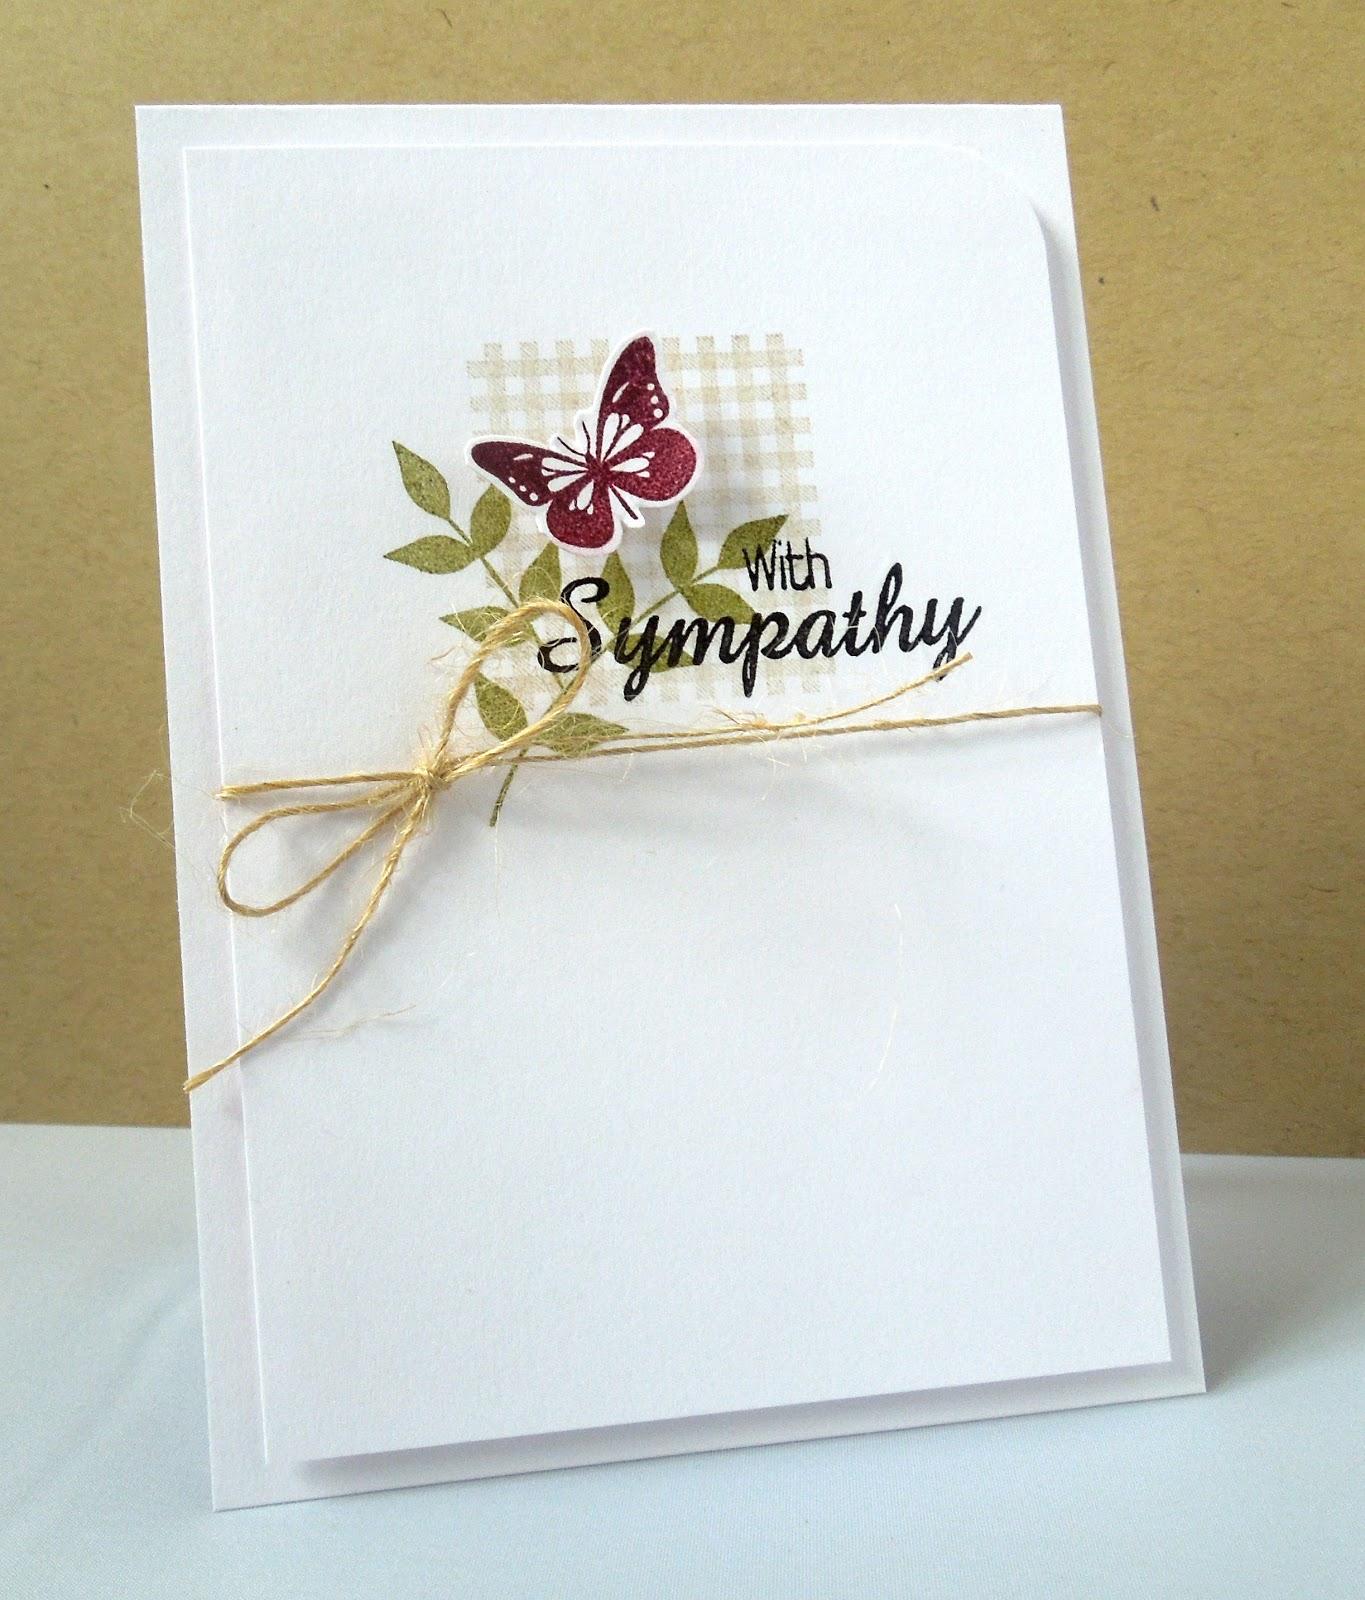 stamping sharing a sympathy card